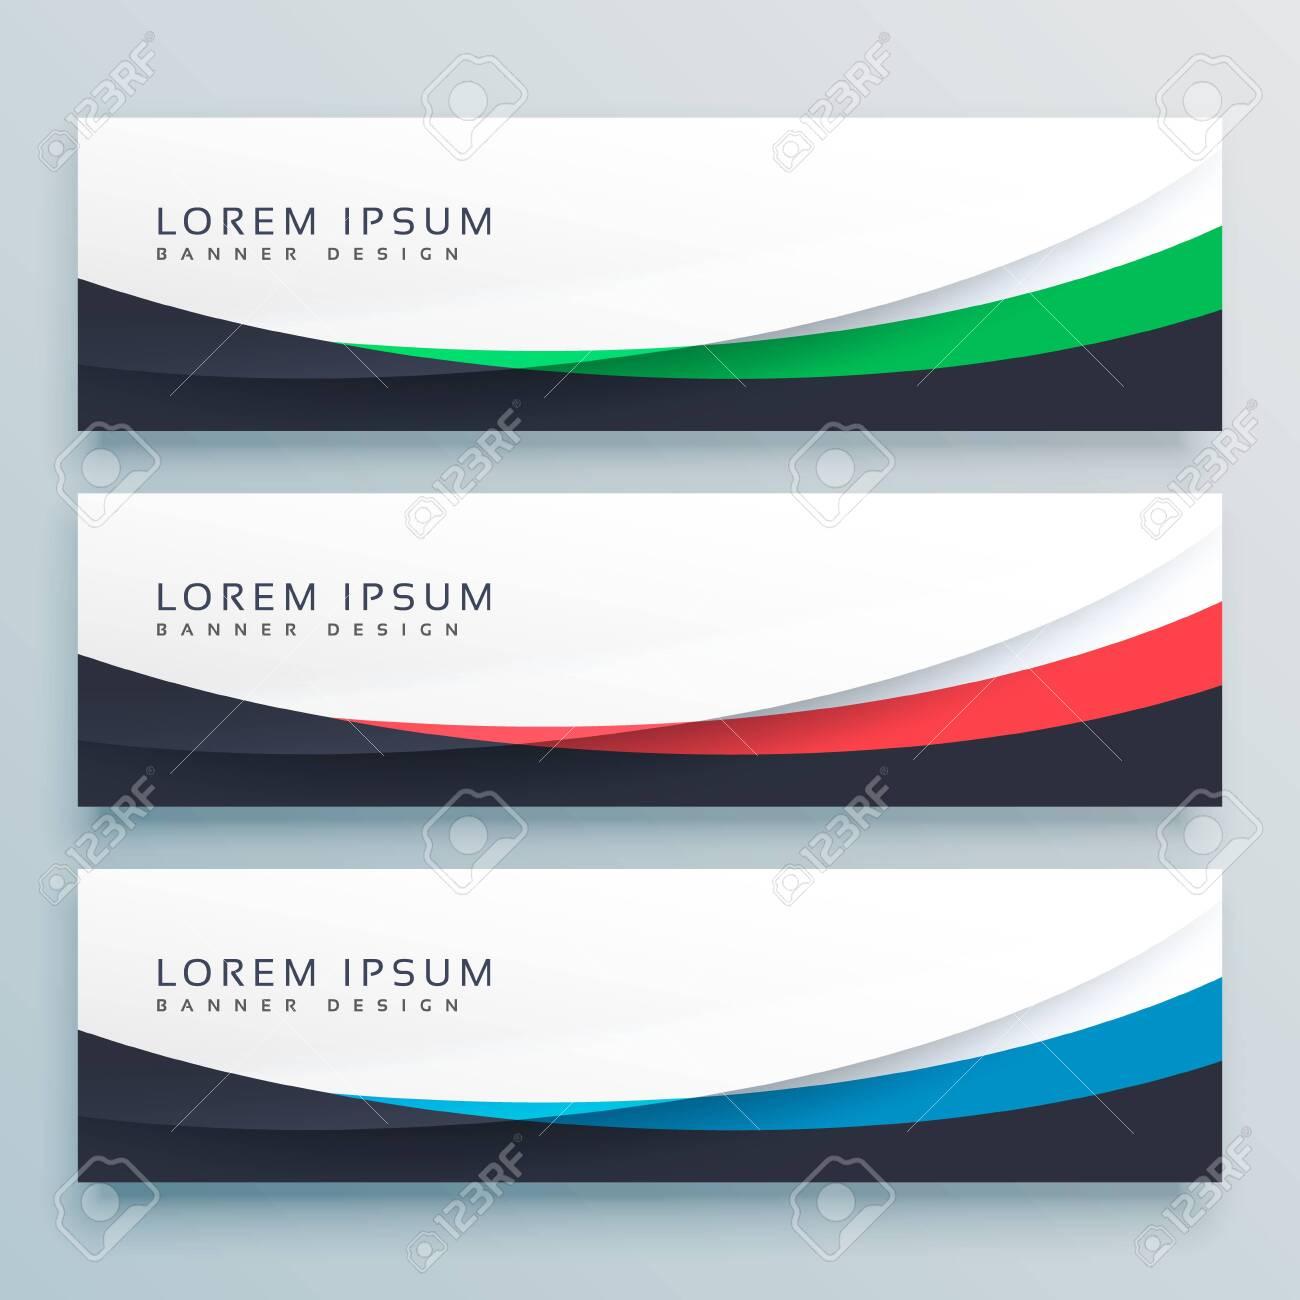 three wavy web banners header vector design - 149119610